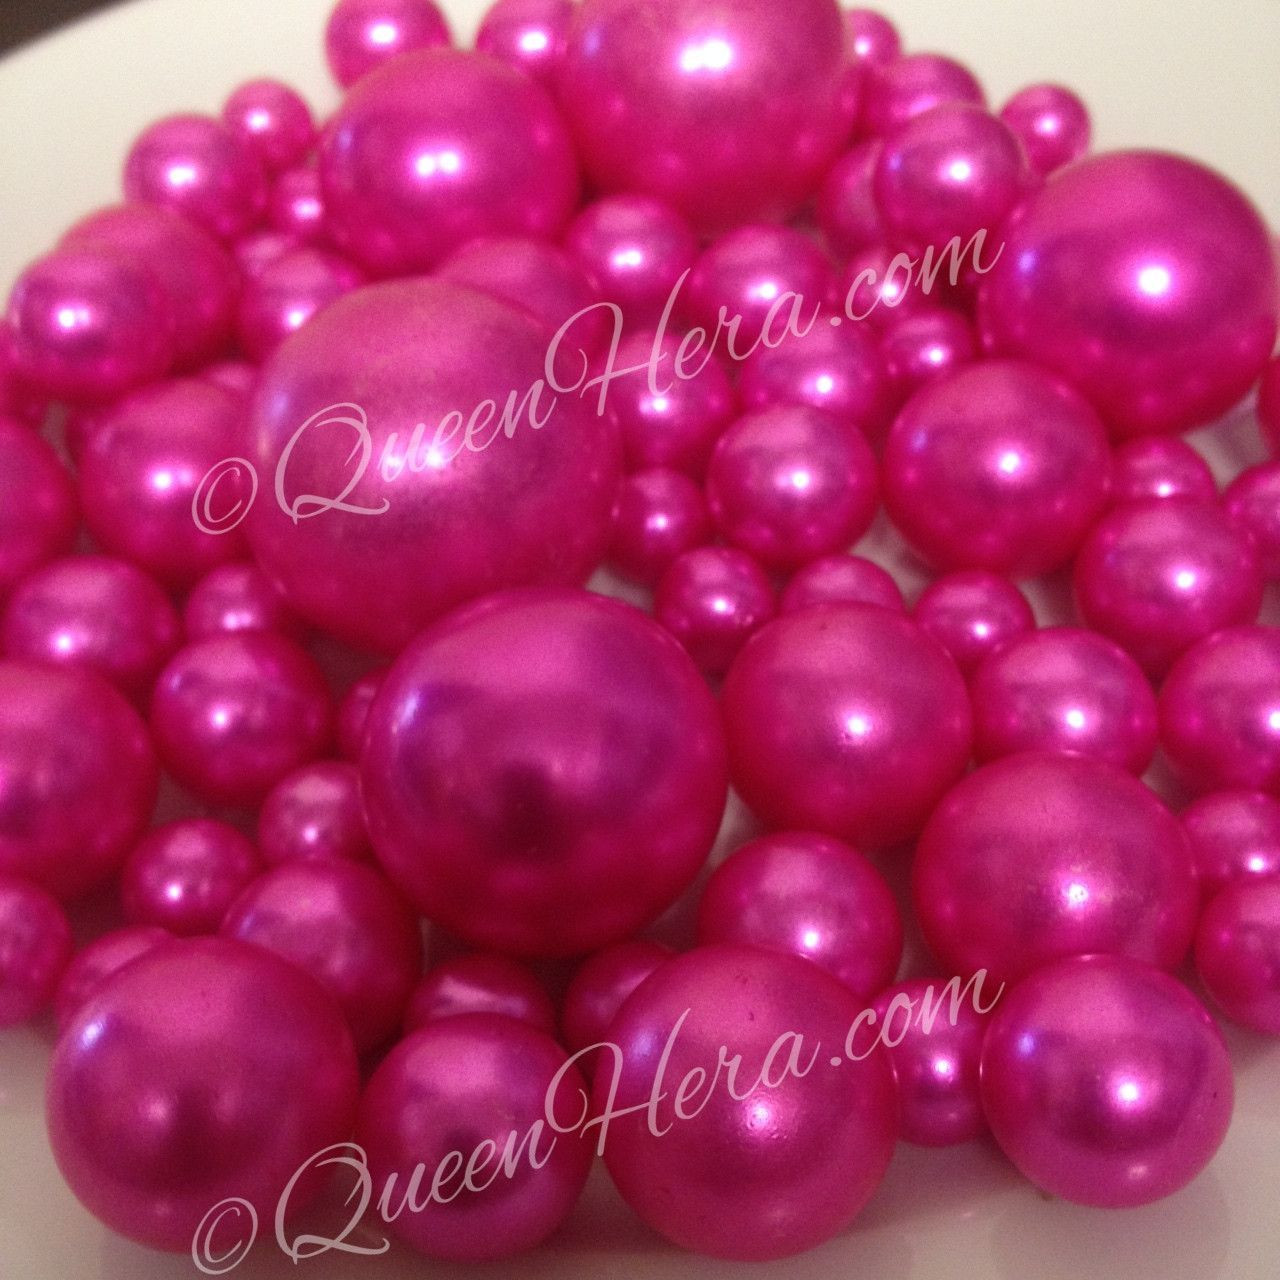 loose pearls vase filler wholesale of magenta pink pearls decorative jumbo vase filler pearls floating in magenta pink pearls decorative jumbo vase filler pearls floating pearl centerpiece scatters confetti